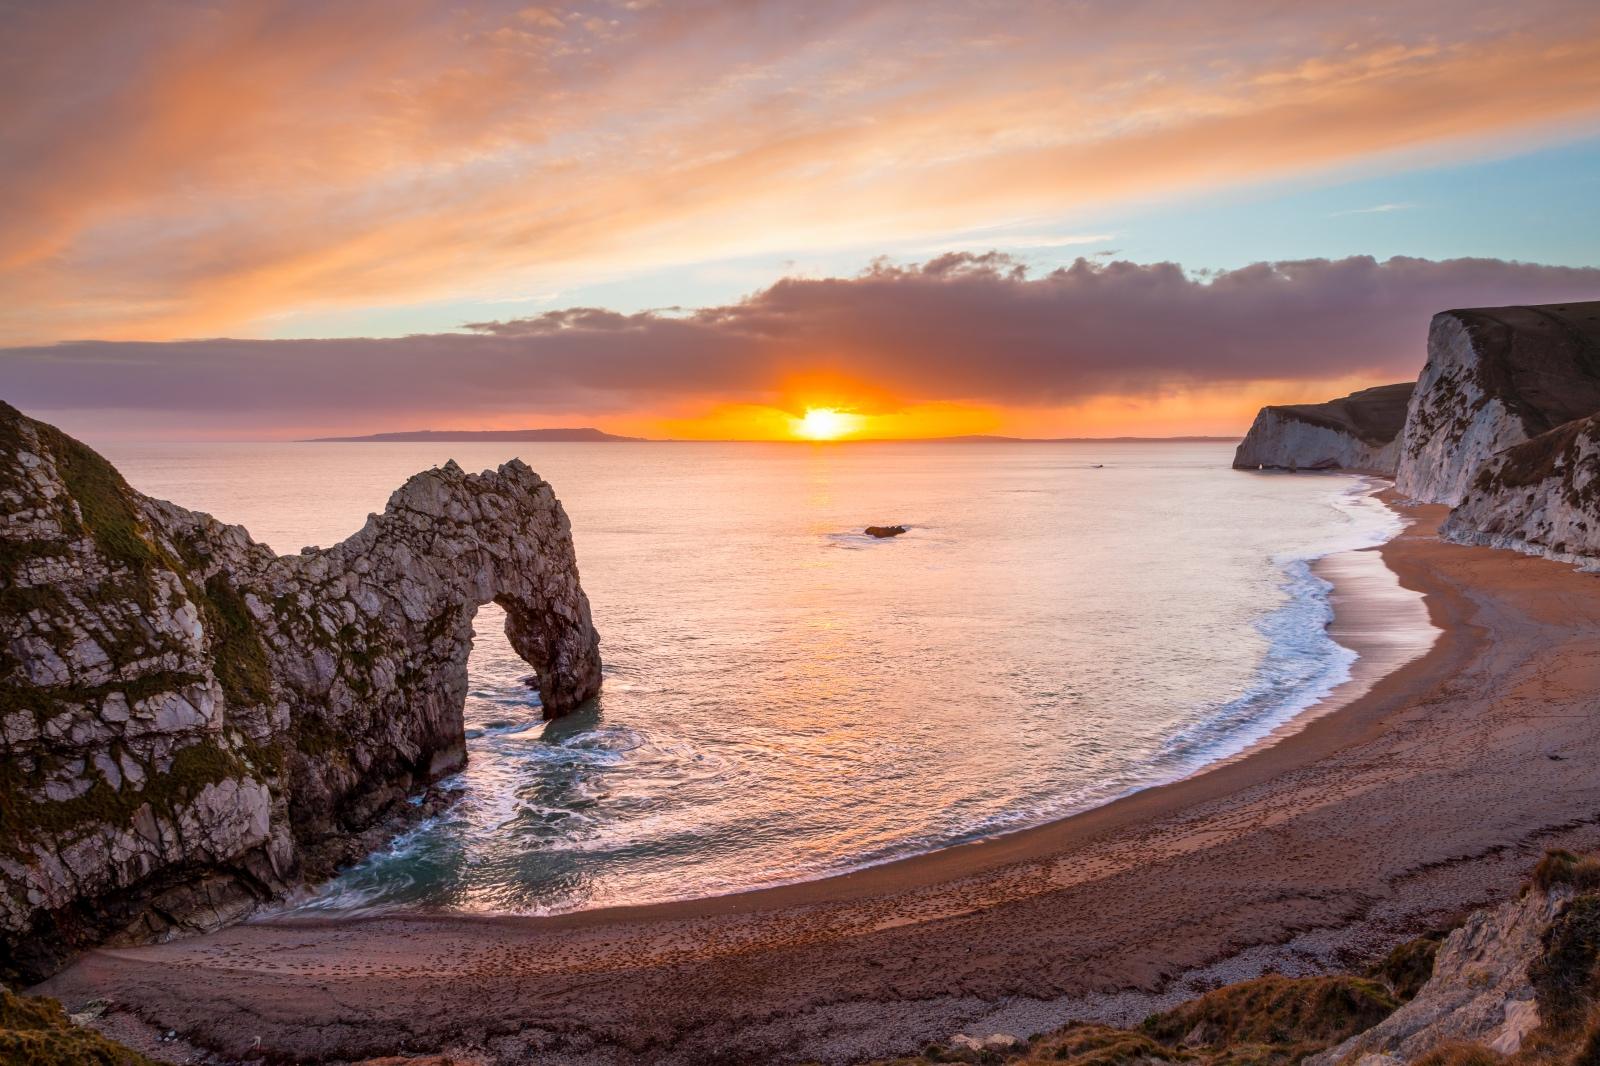 Dorset Aonb A Popular Uk Holiday Destination